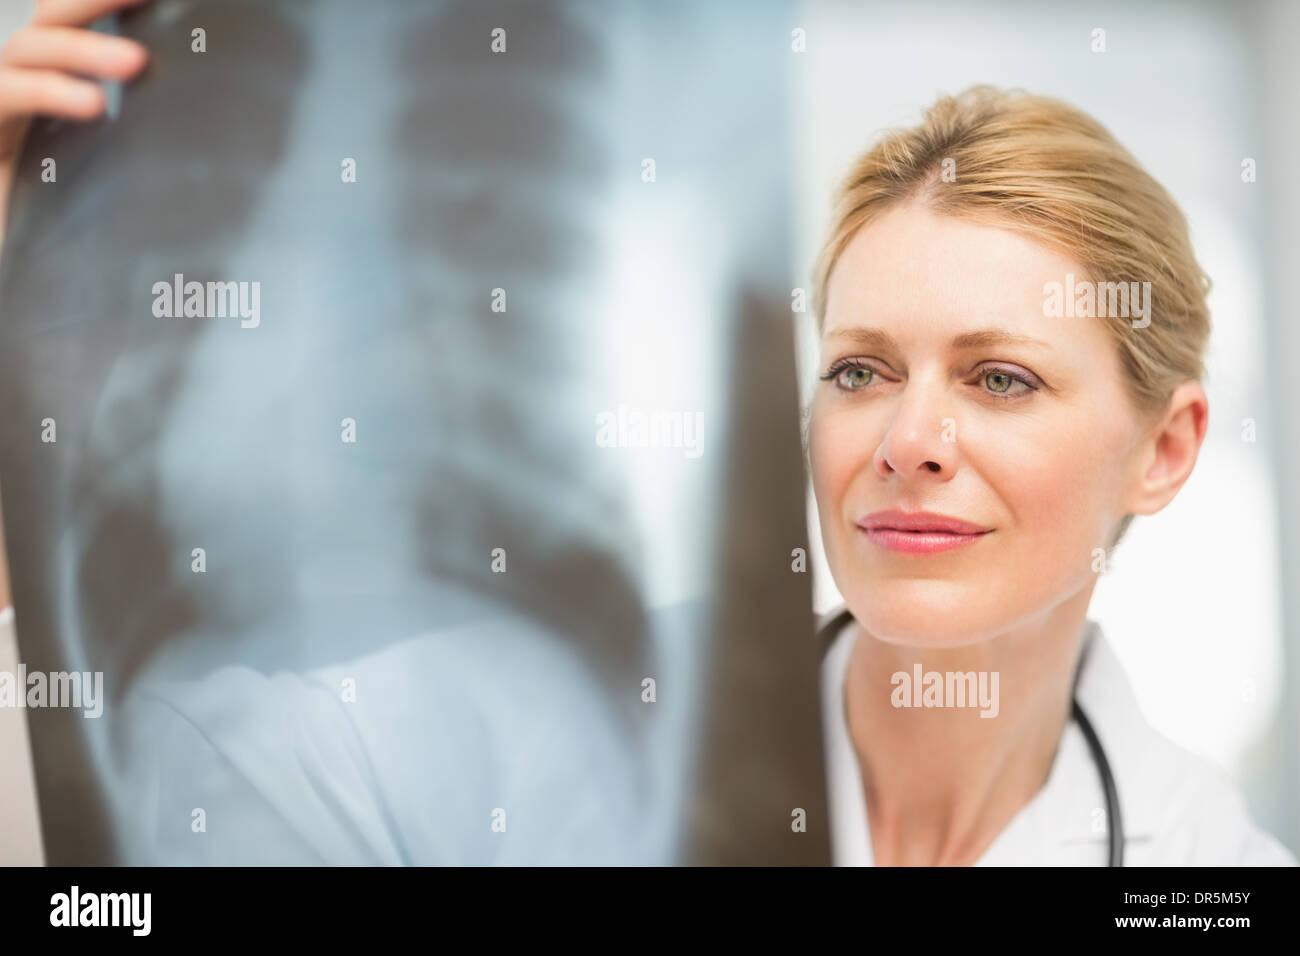 Doctor examining an xray - Stock Image